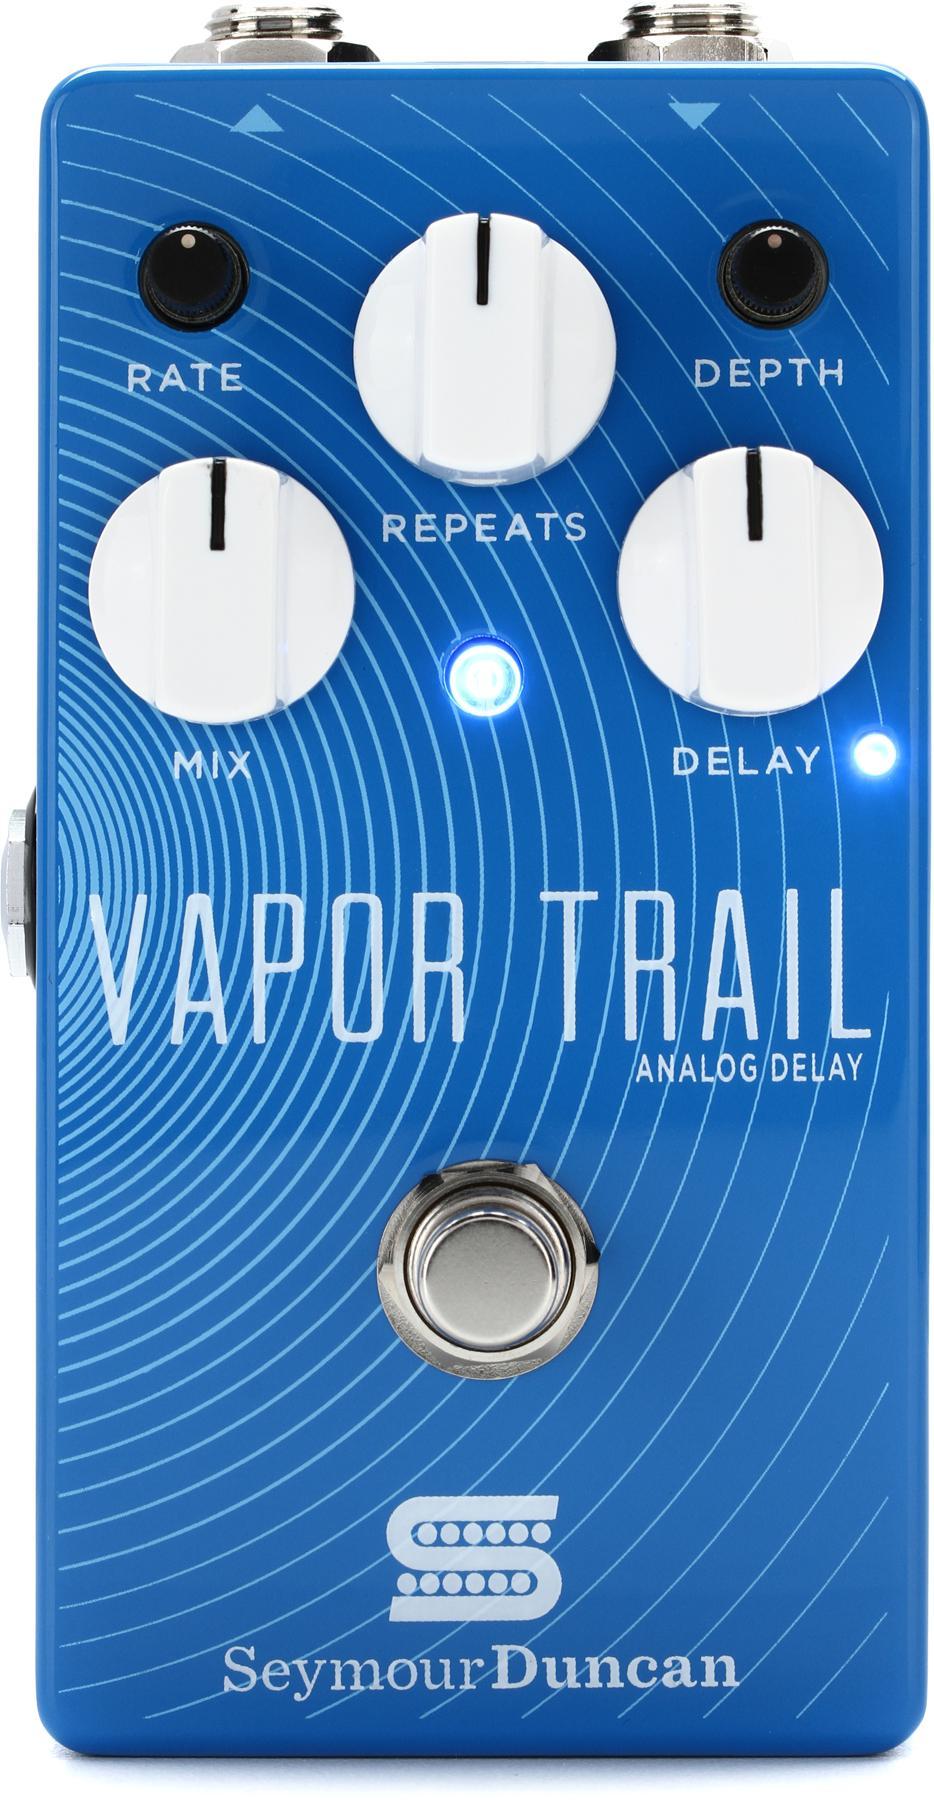 4. Seymour Duncan Vapor Trail Analog Delay Pedal